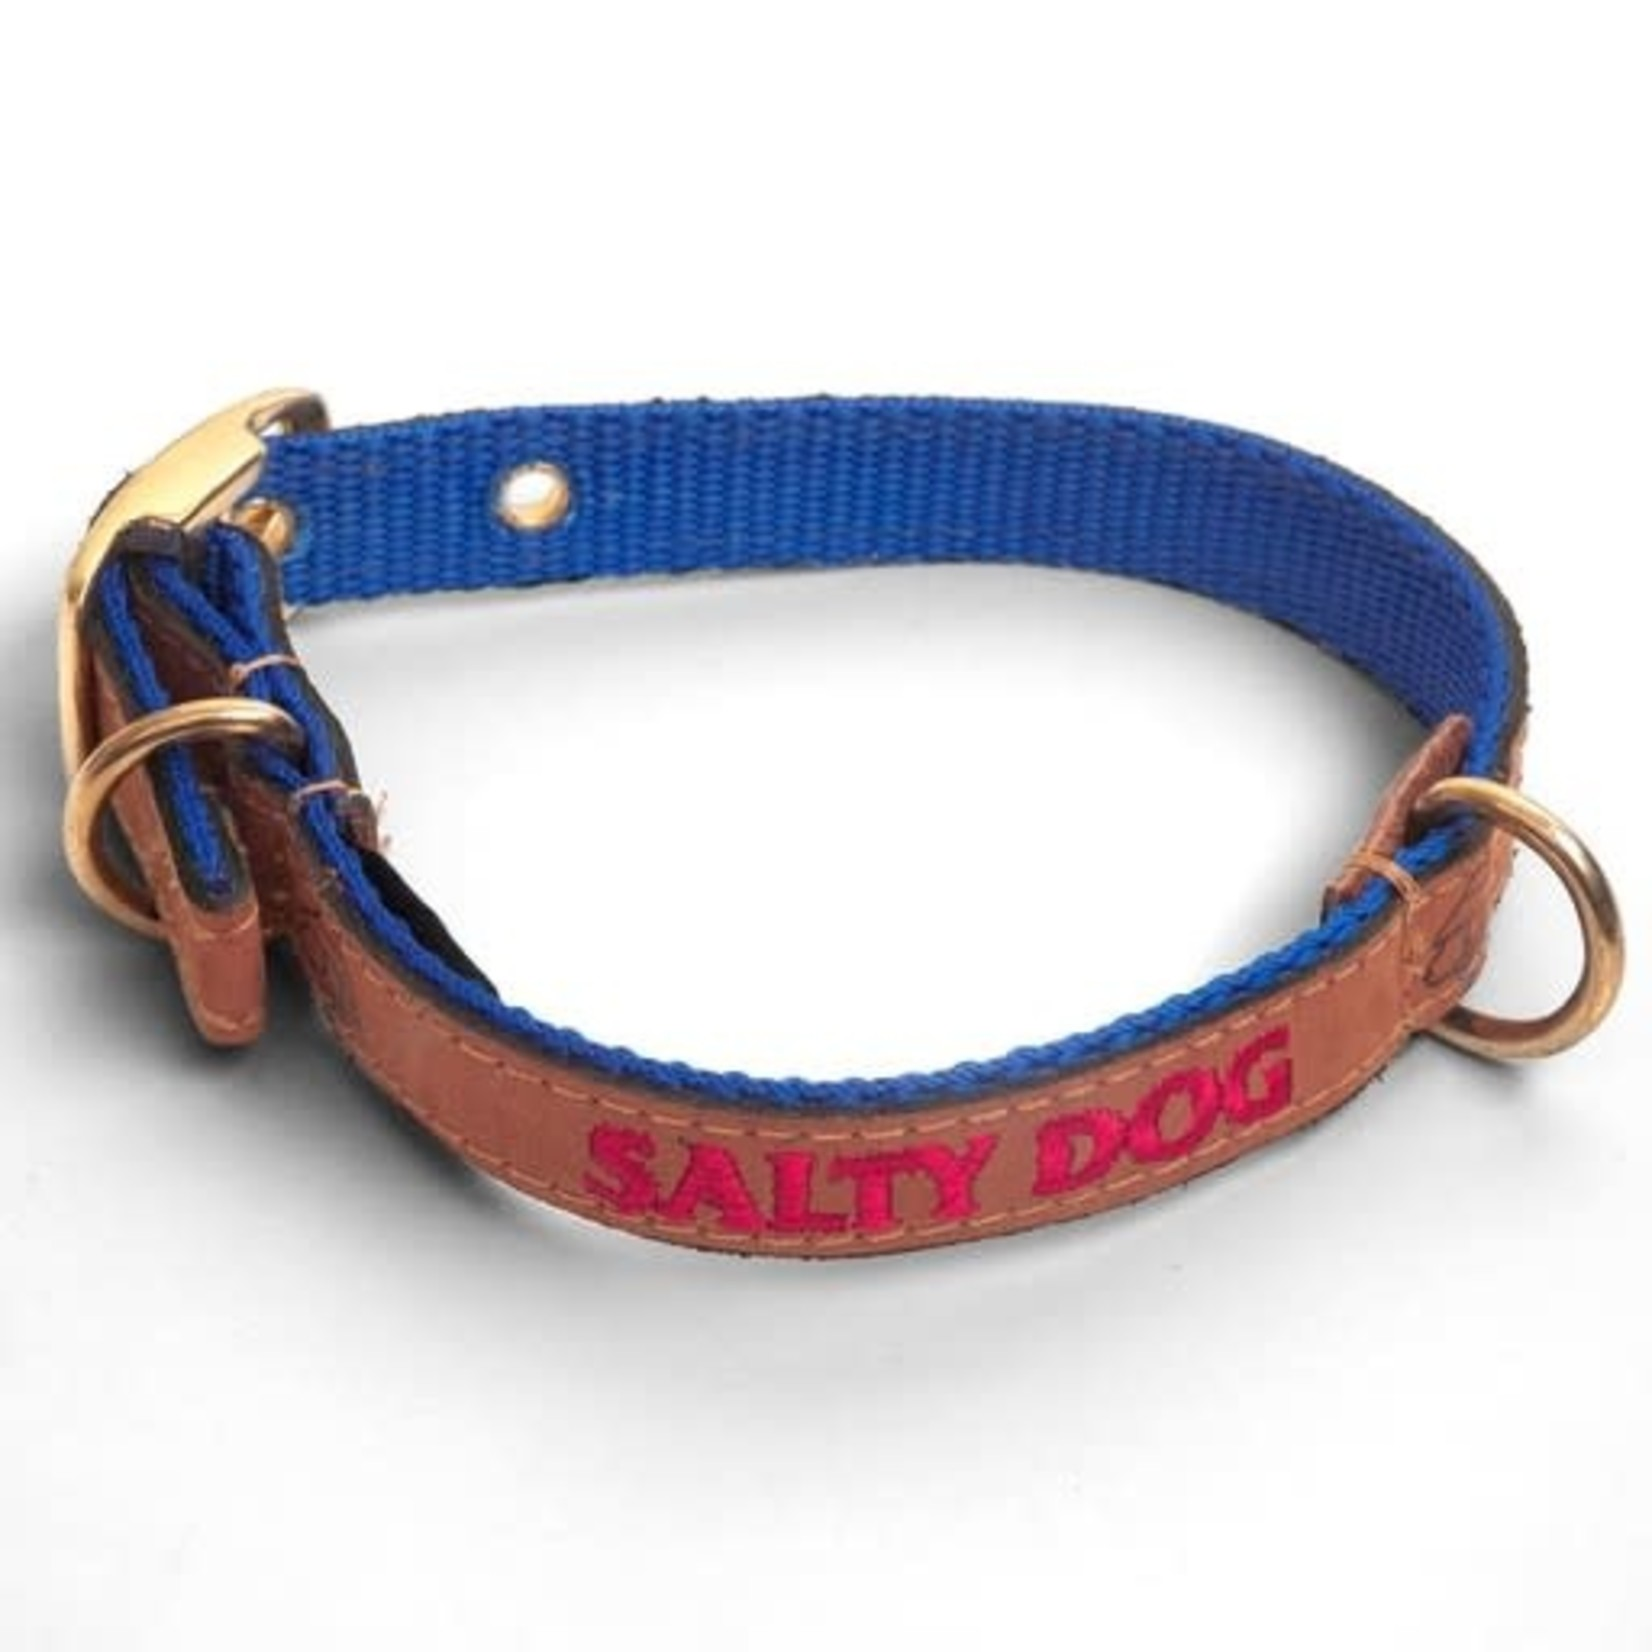 Collar - Leather Royal